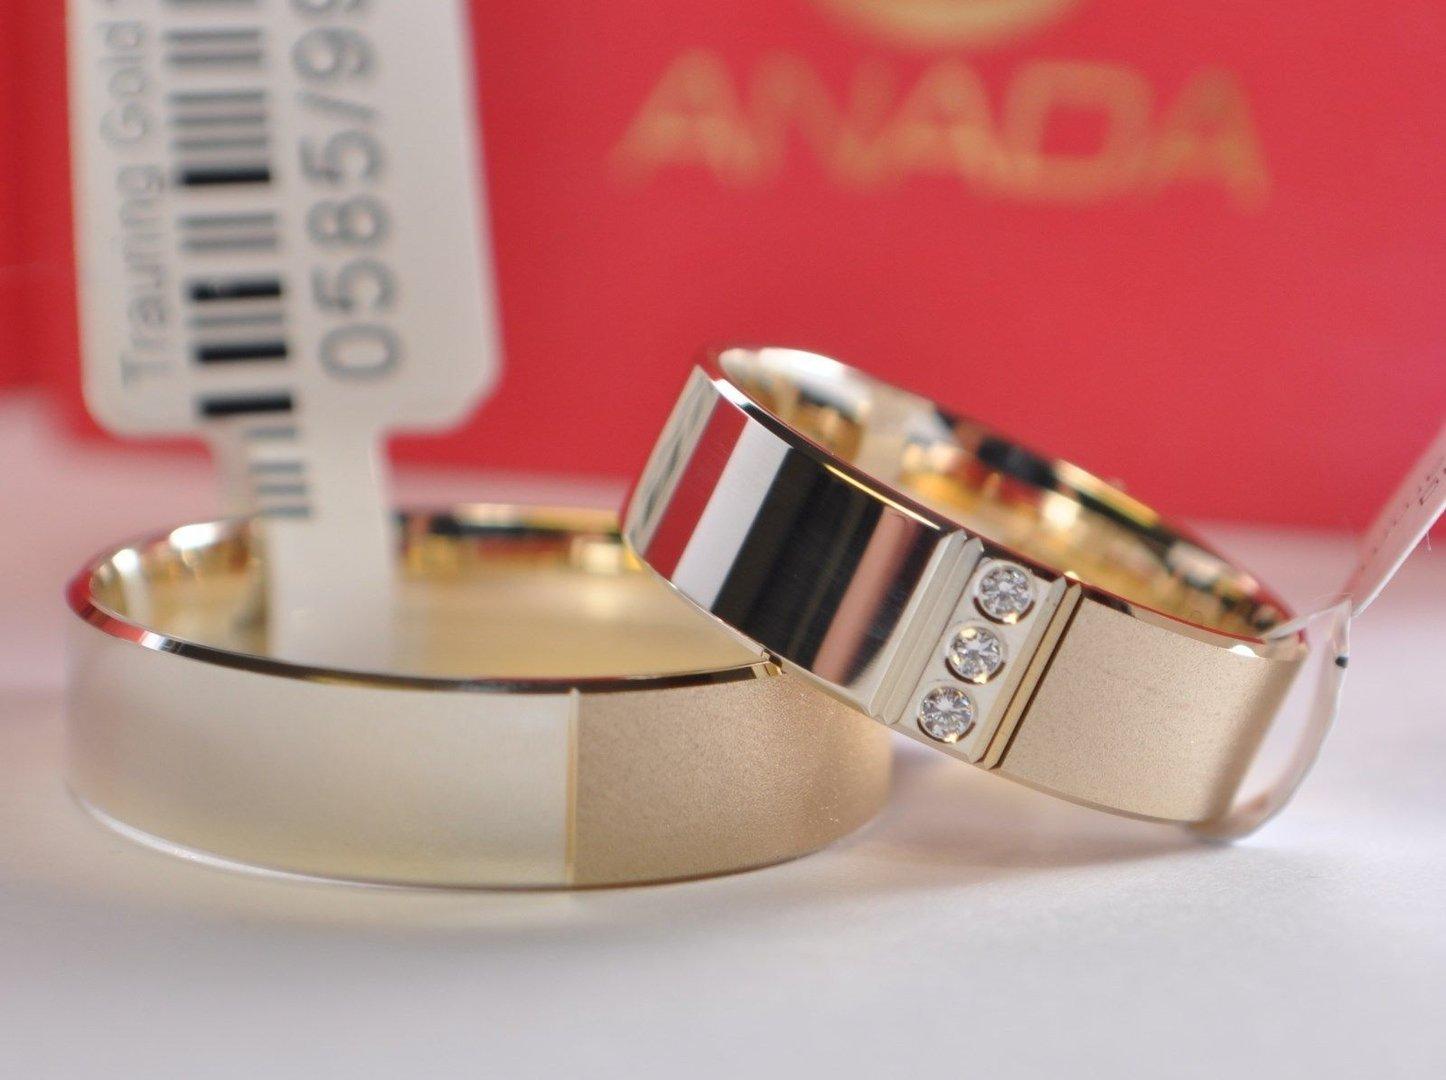 1 Paar Trauringe Hochzeitsringe Gold 585 Bicolor Mit 3 Diamanten 002ct B 60mm Top